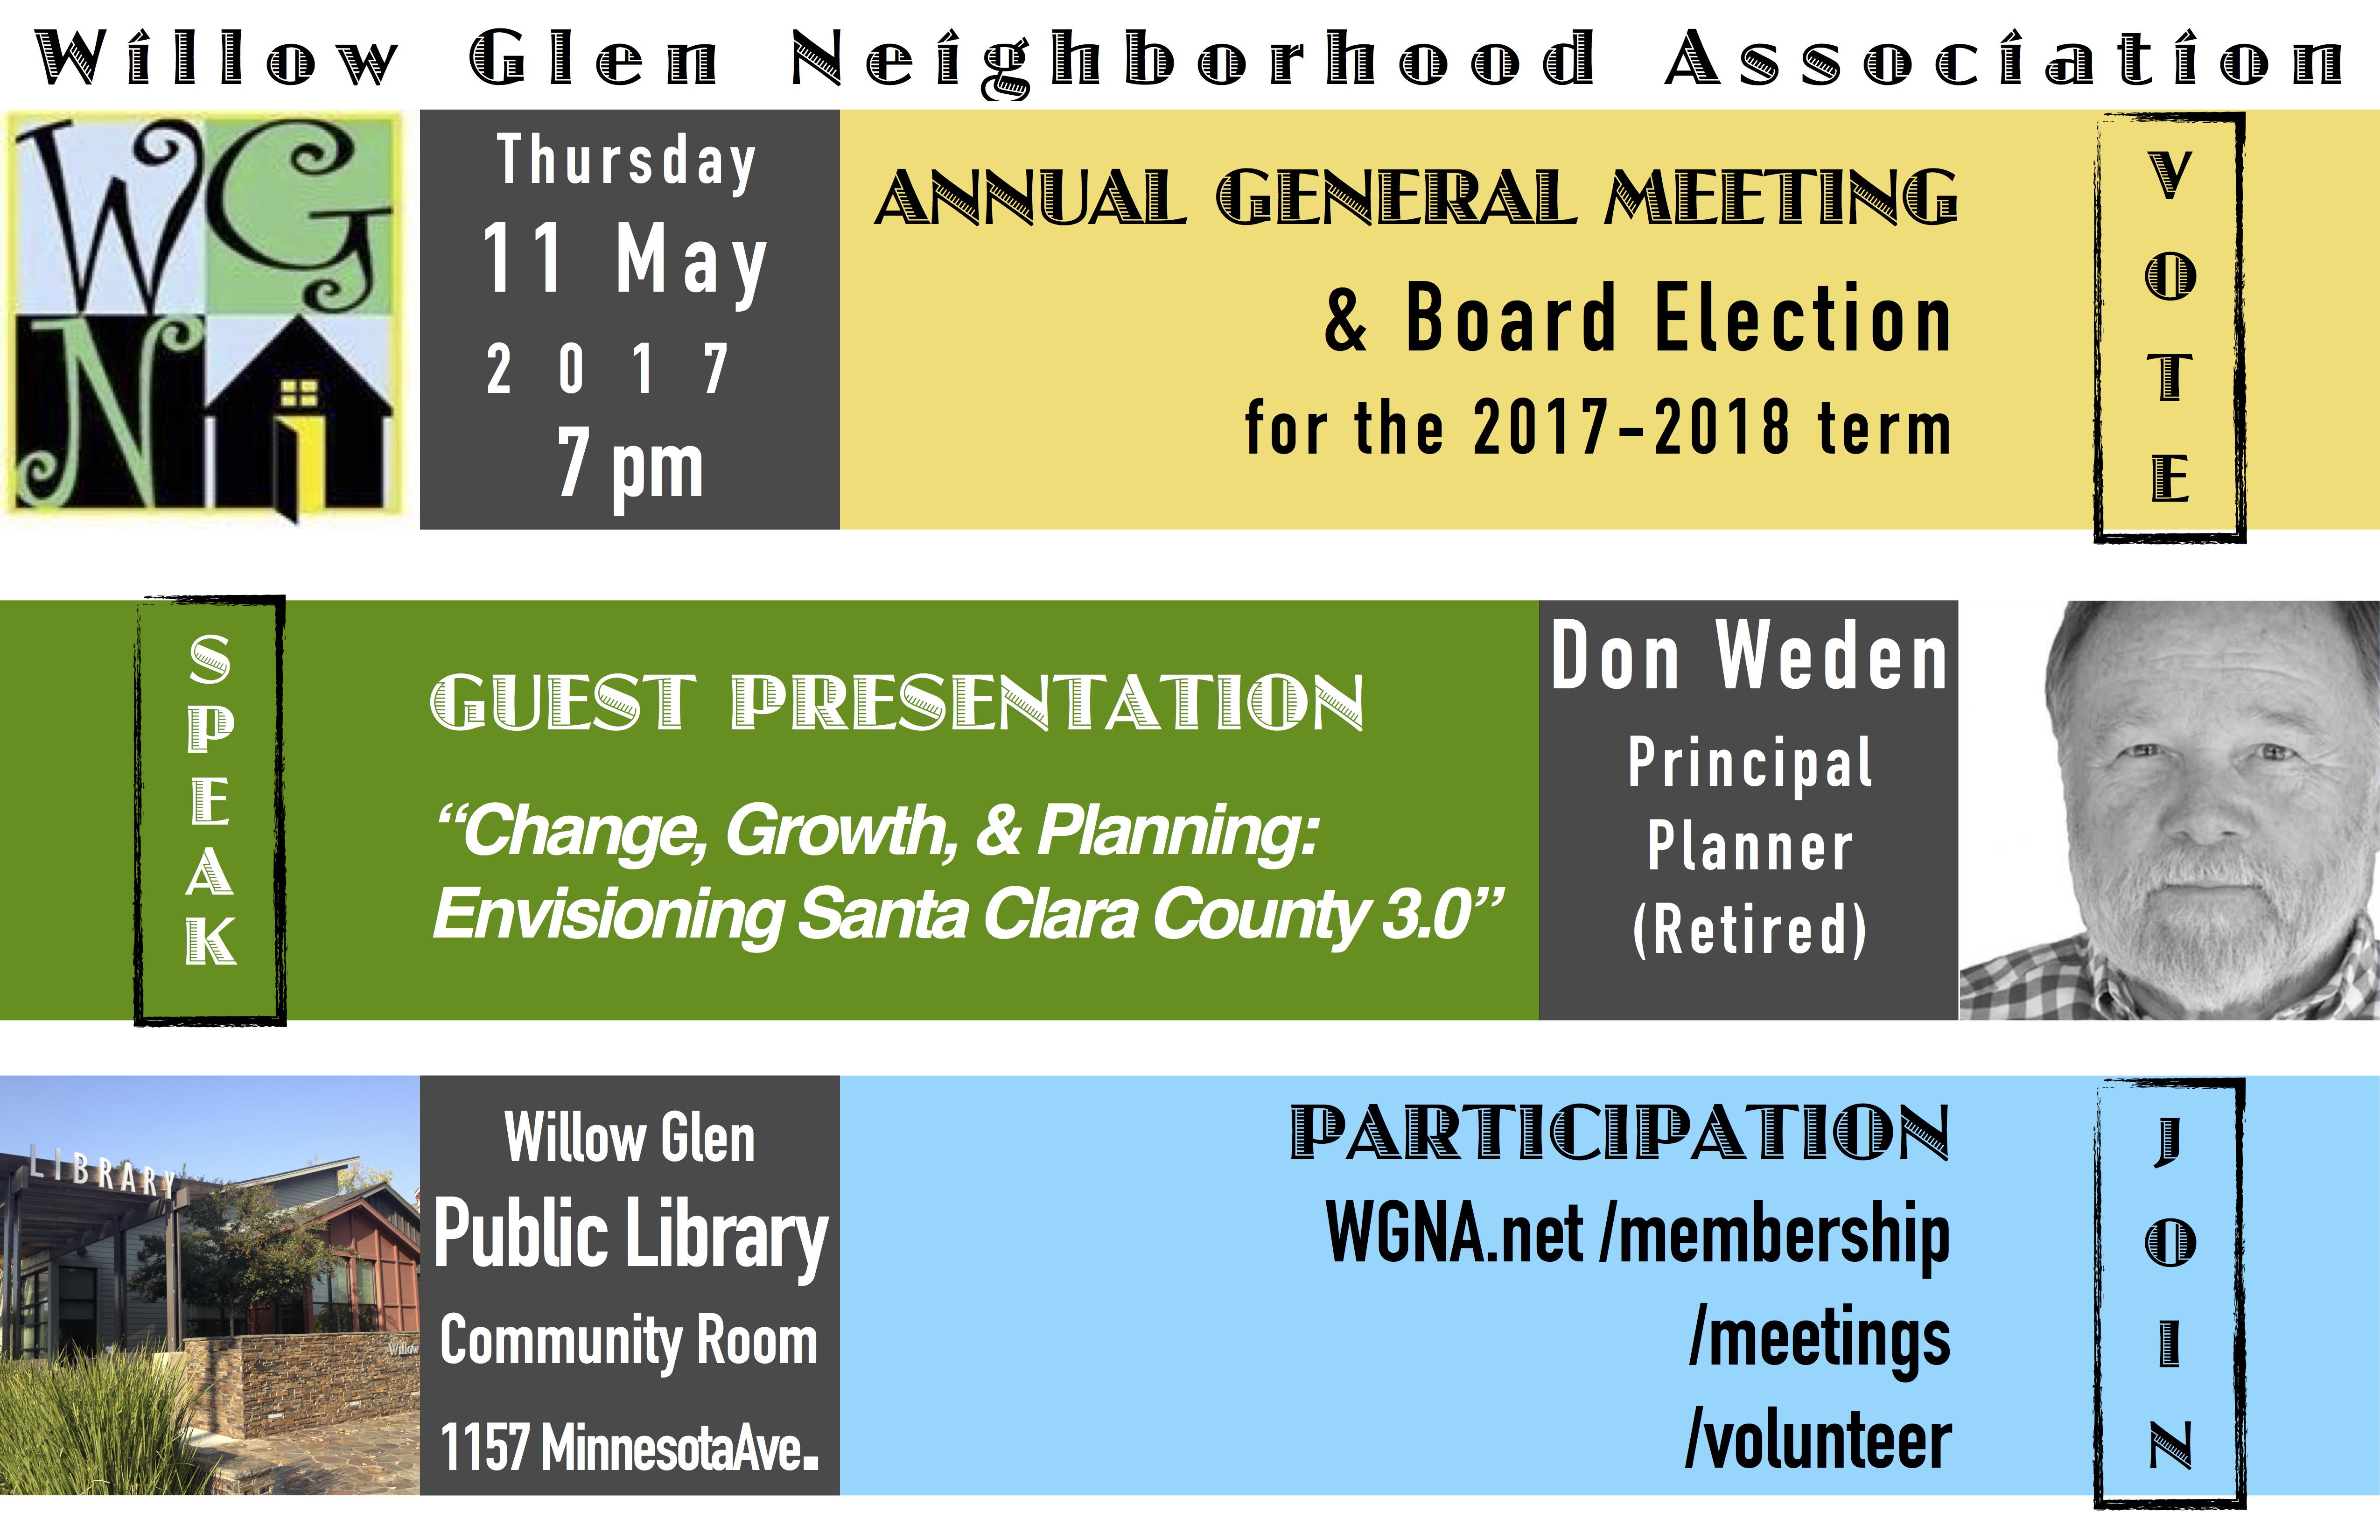 WGNA__Annual_General_Meeting_May_2017.jpg